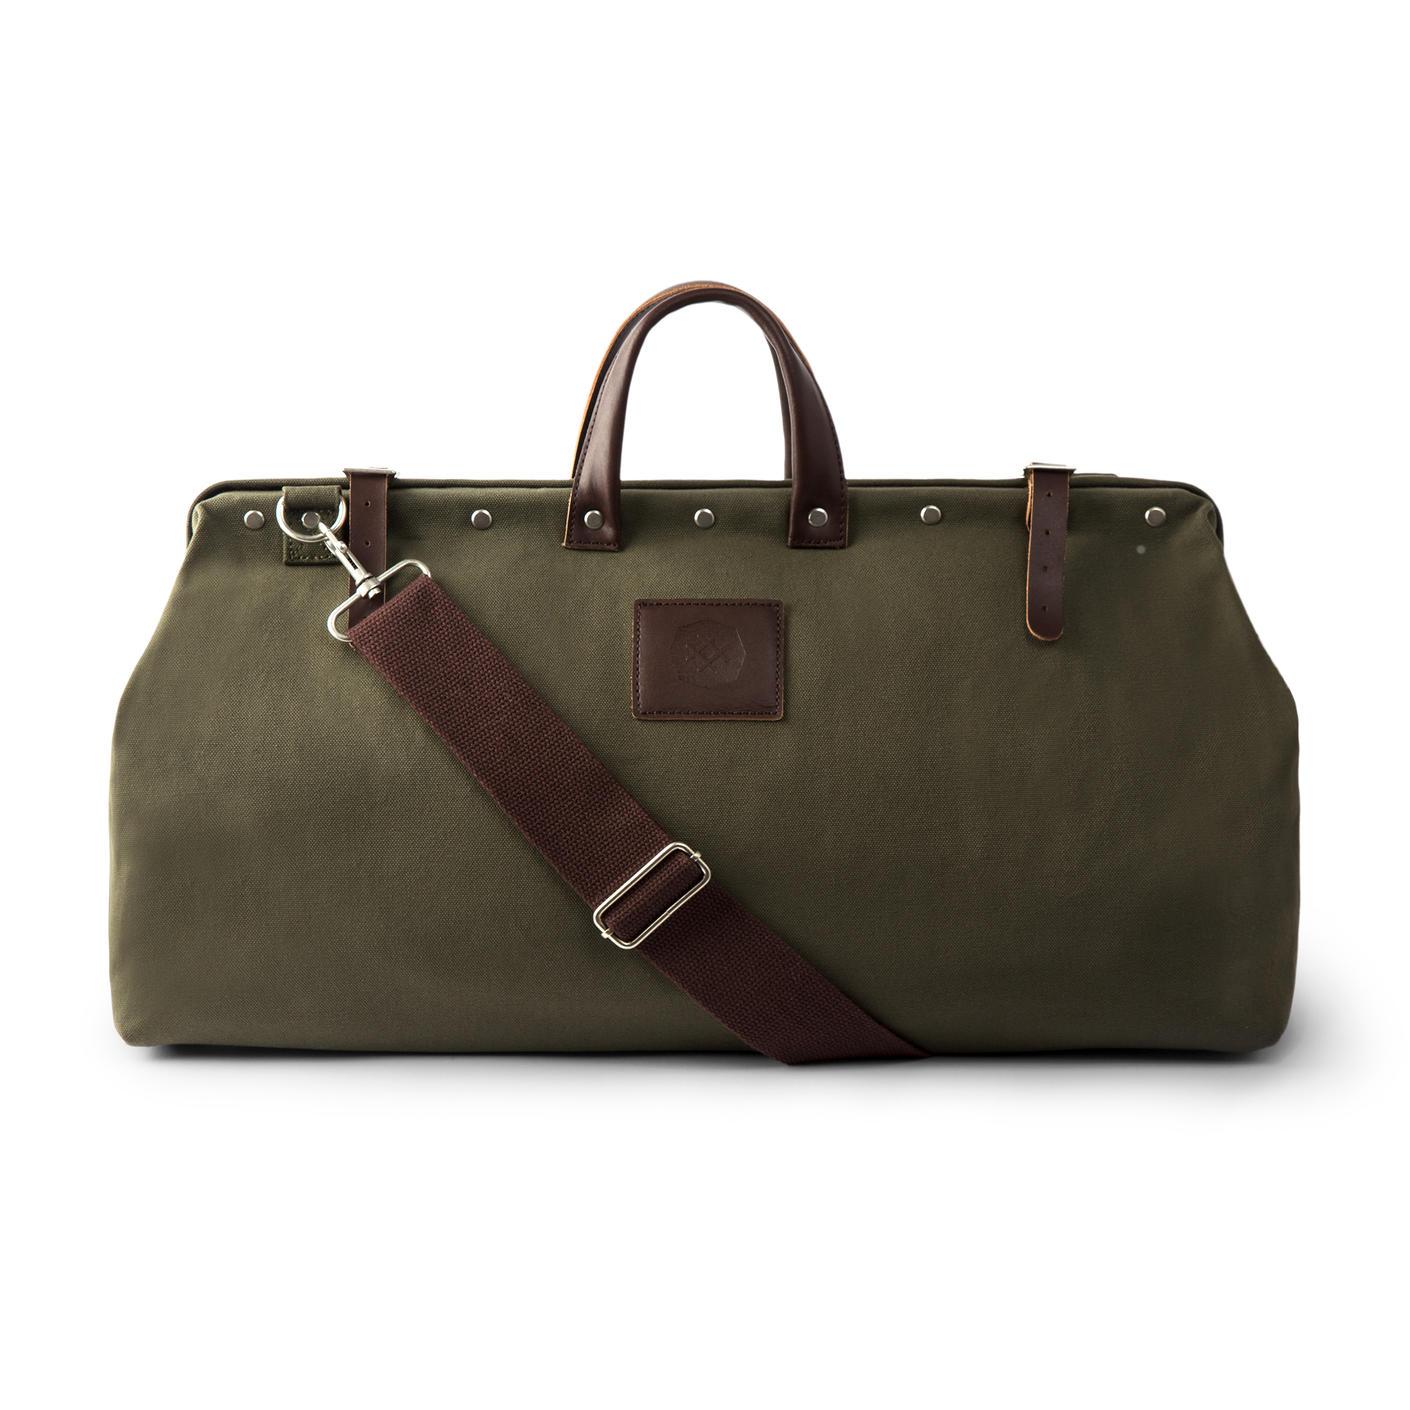 Weekender Bag with Shoe Compartment | Weekender Bag for Men | Duffle Bag for Men